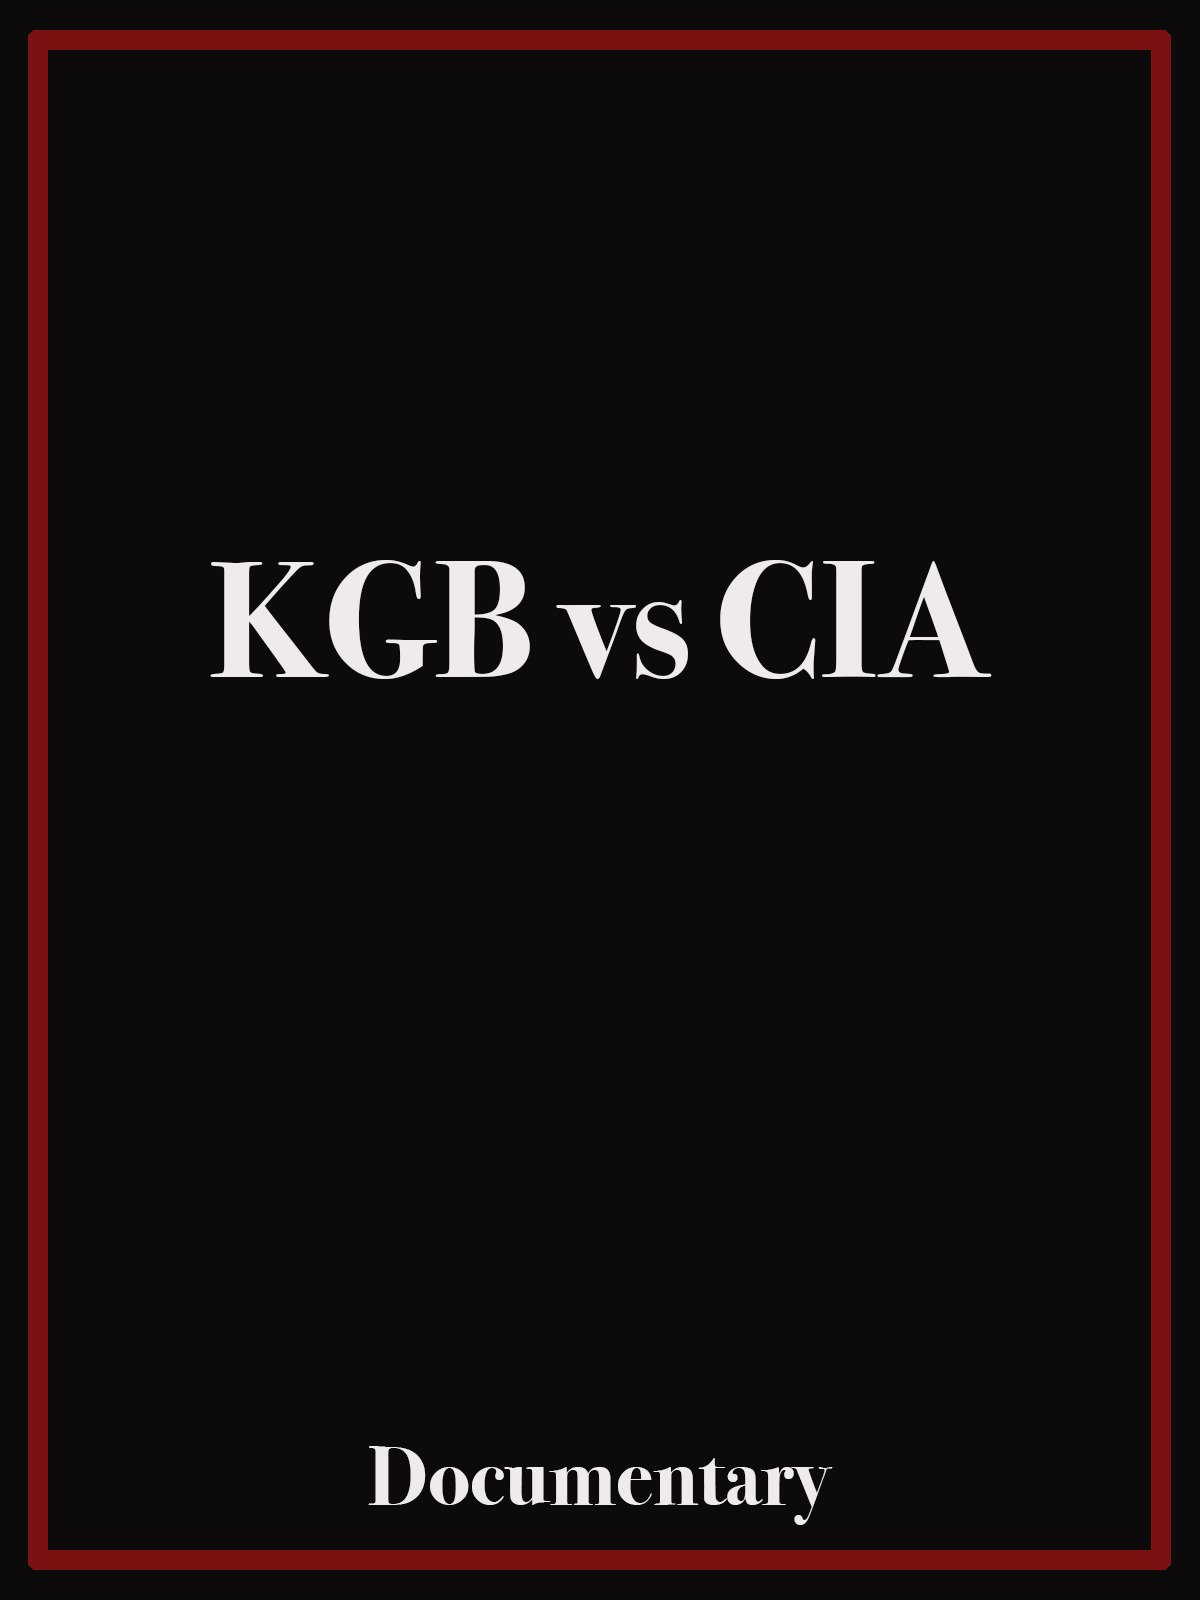 Amazon com: Watch KGB vs CIA Documentary | Prime Video